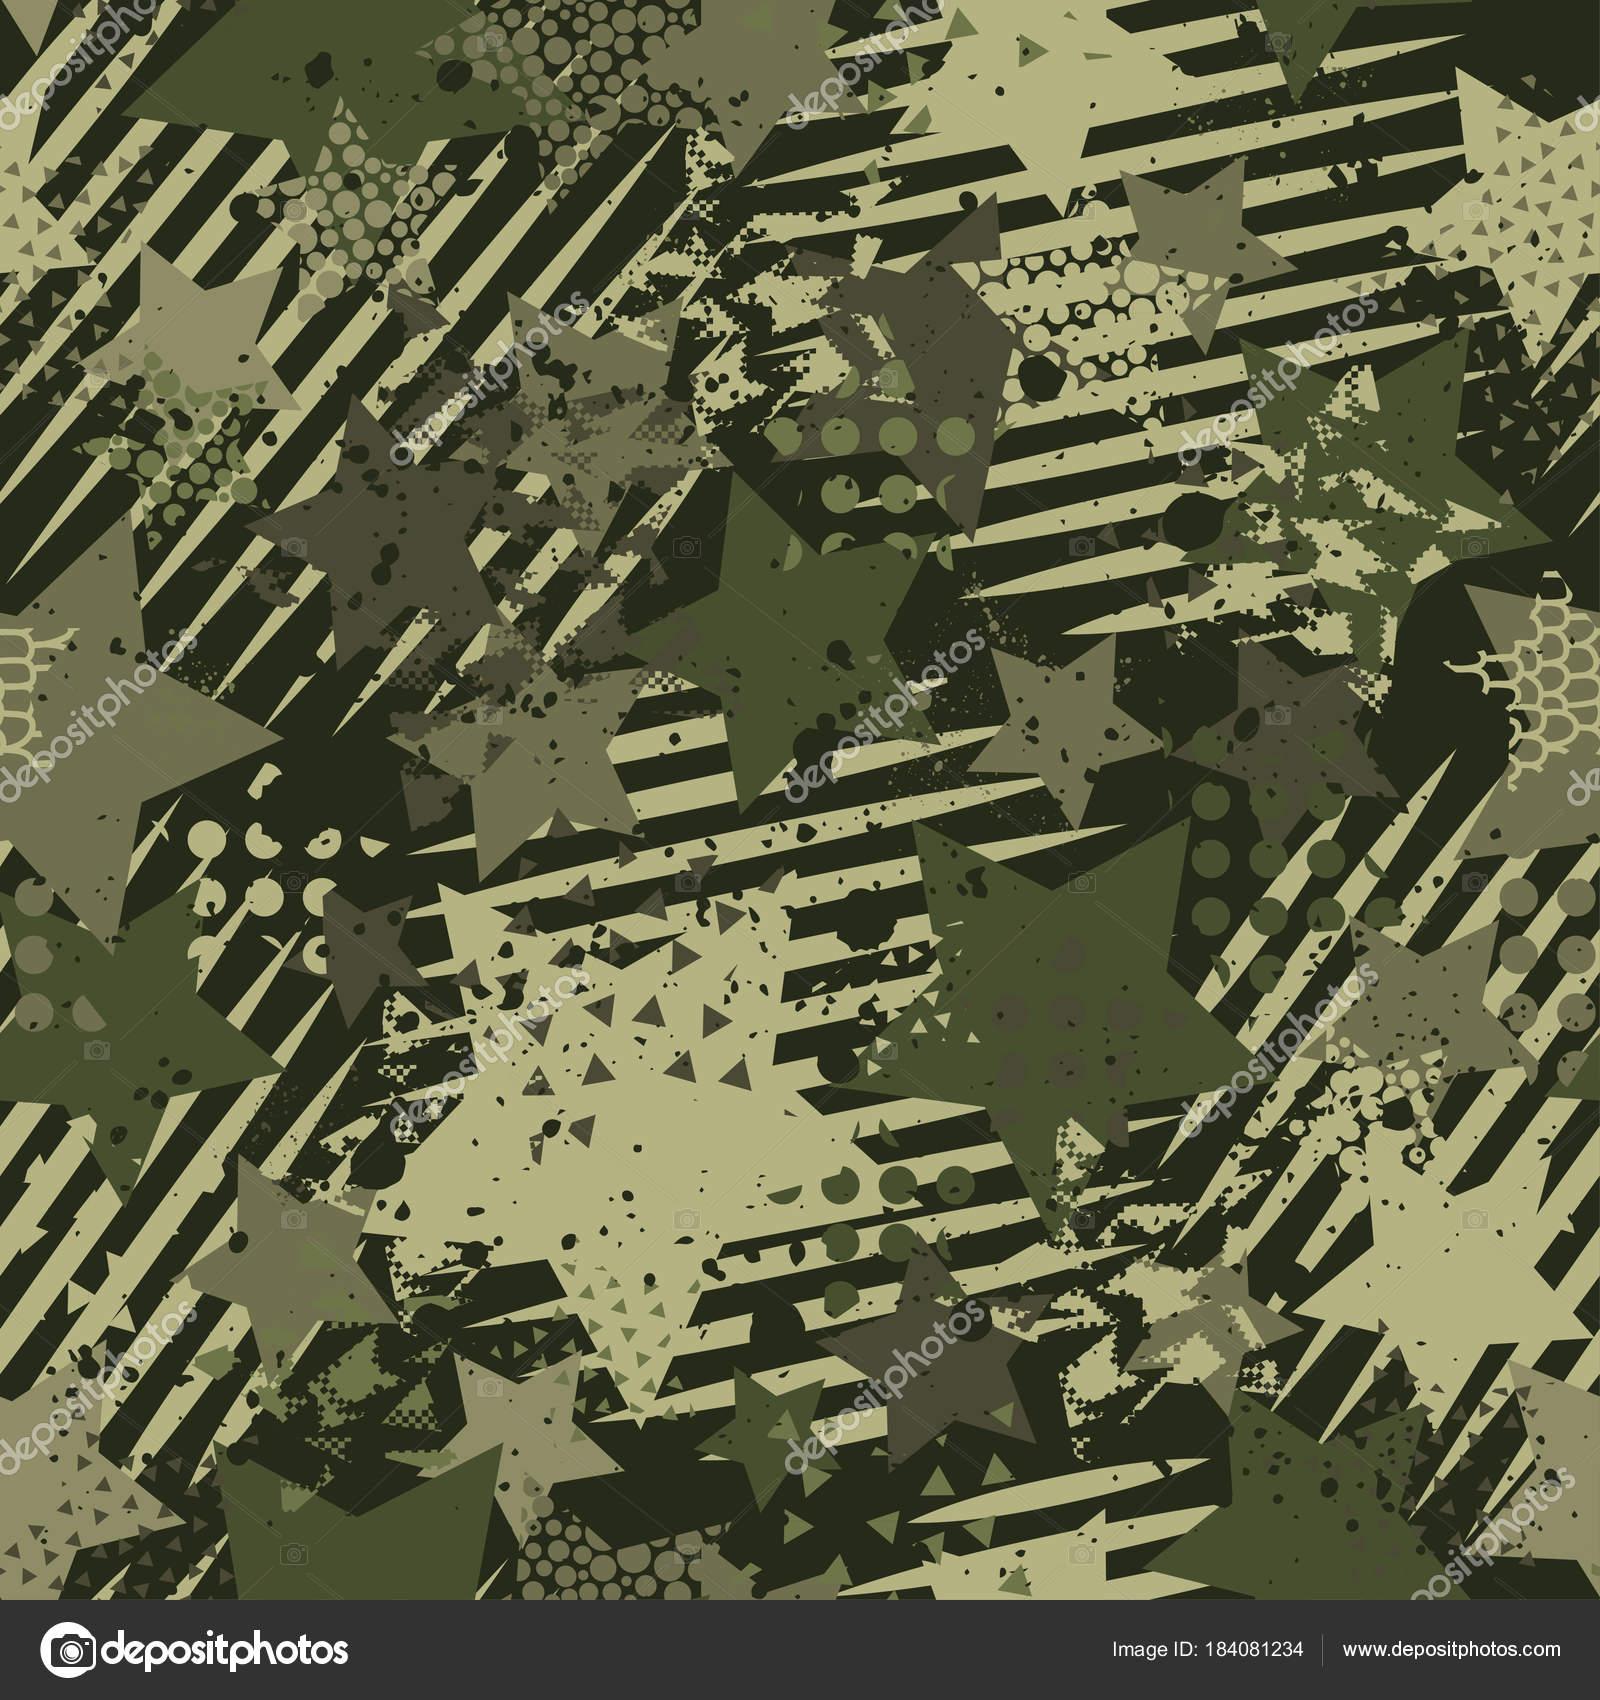 Resumen camuflaje patrones sin fisuras textura militar repite ropa ...